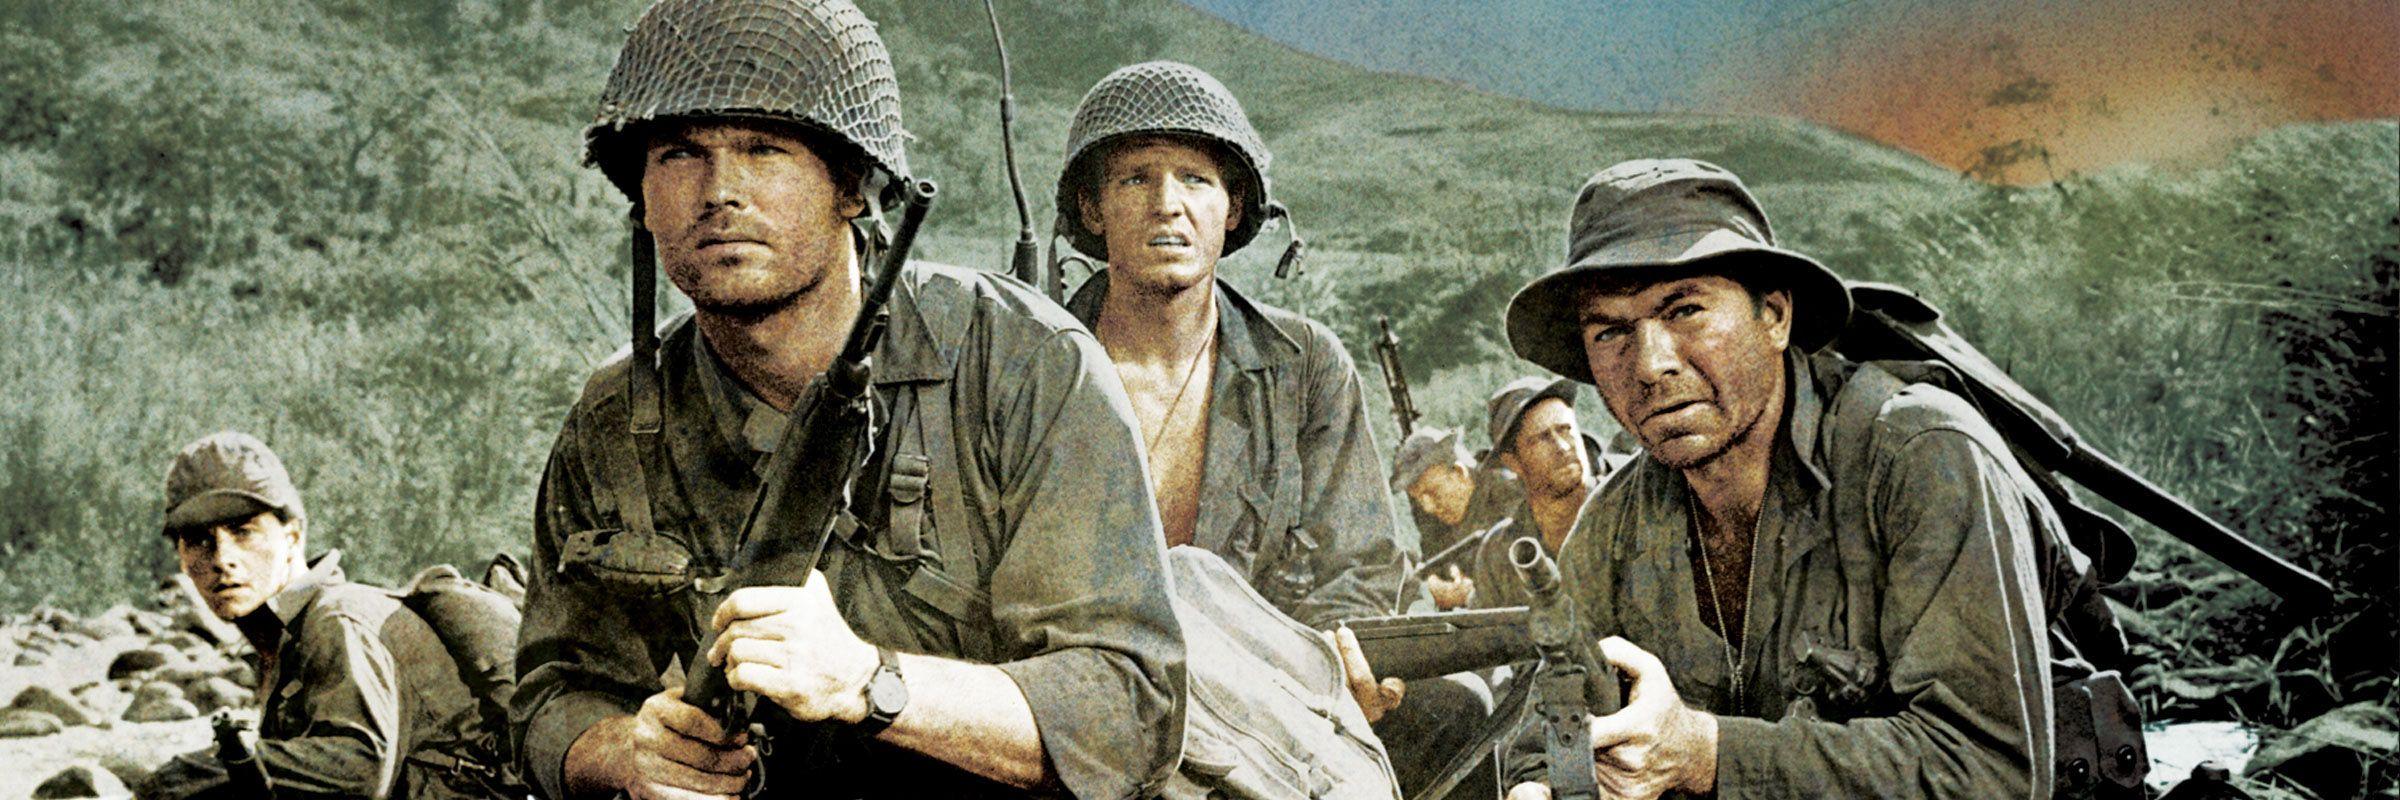 War Movie : Merrill's Marauders (1962)